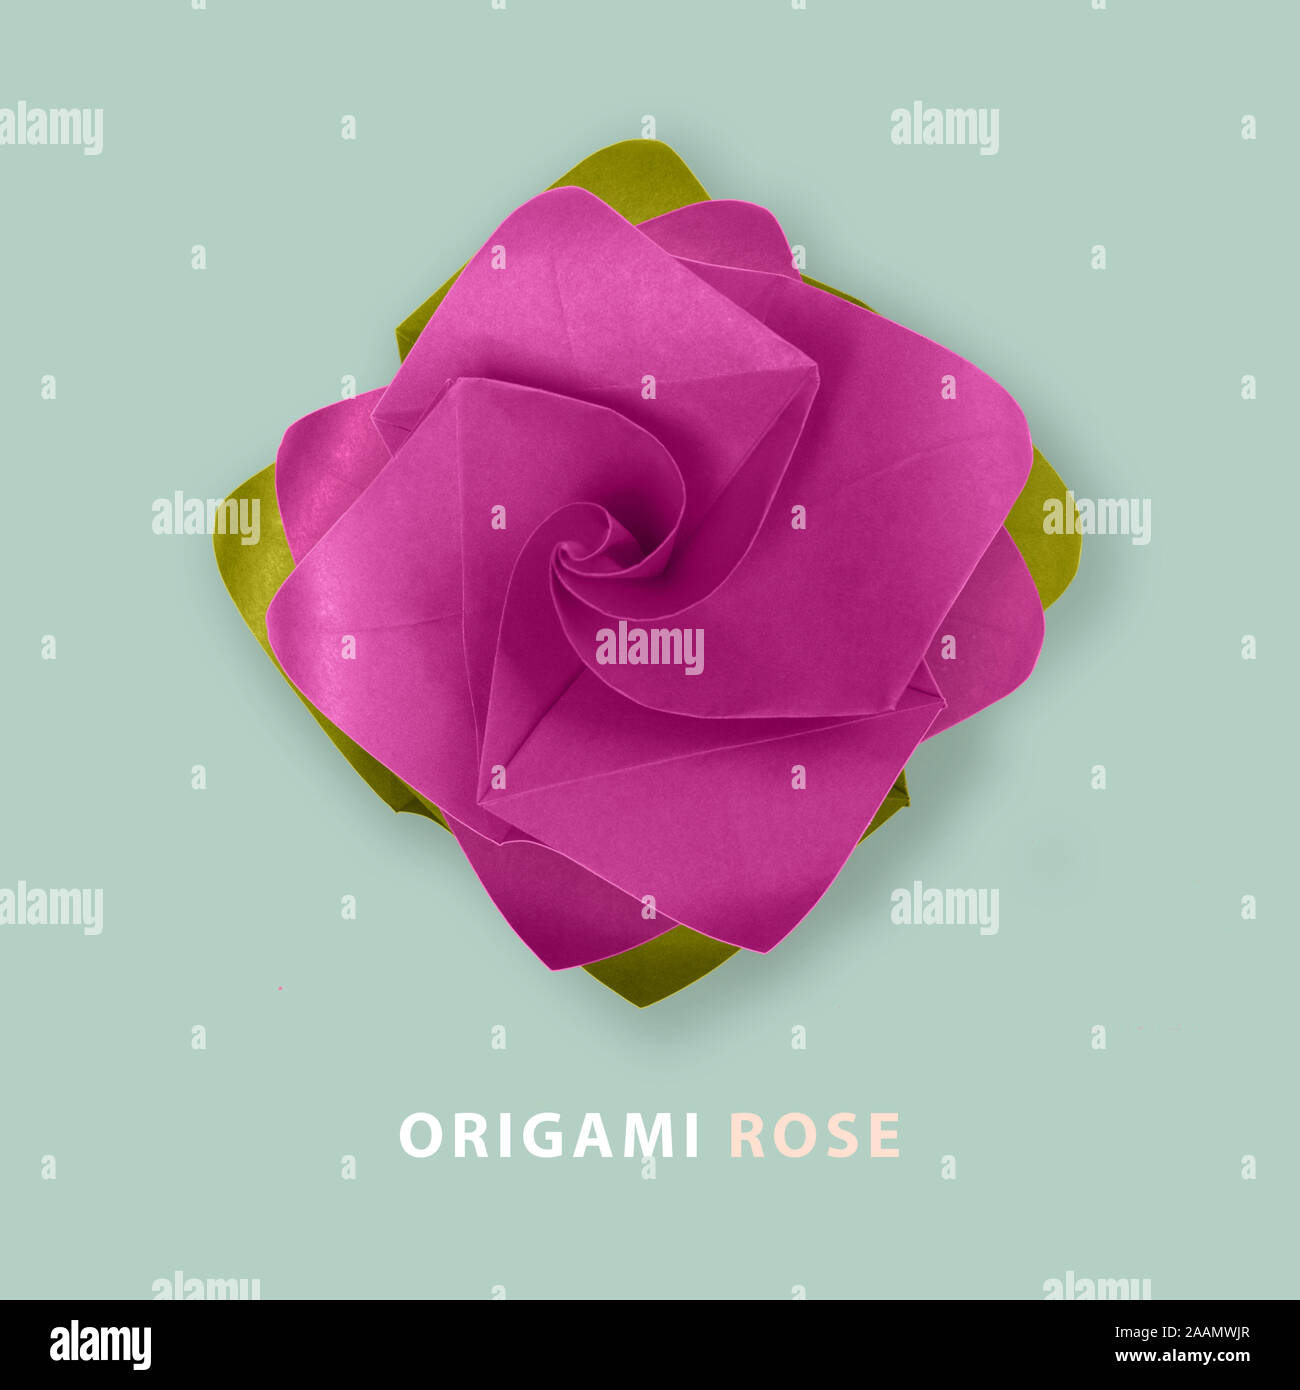 Rosa Lila Papier origami handgemachte Rose auf Blau Stockfoto